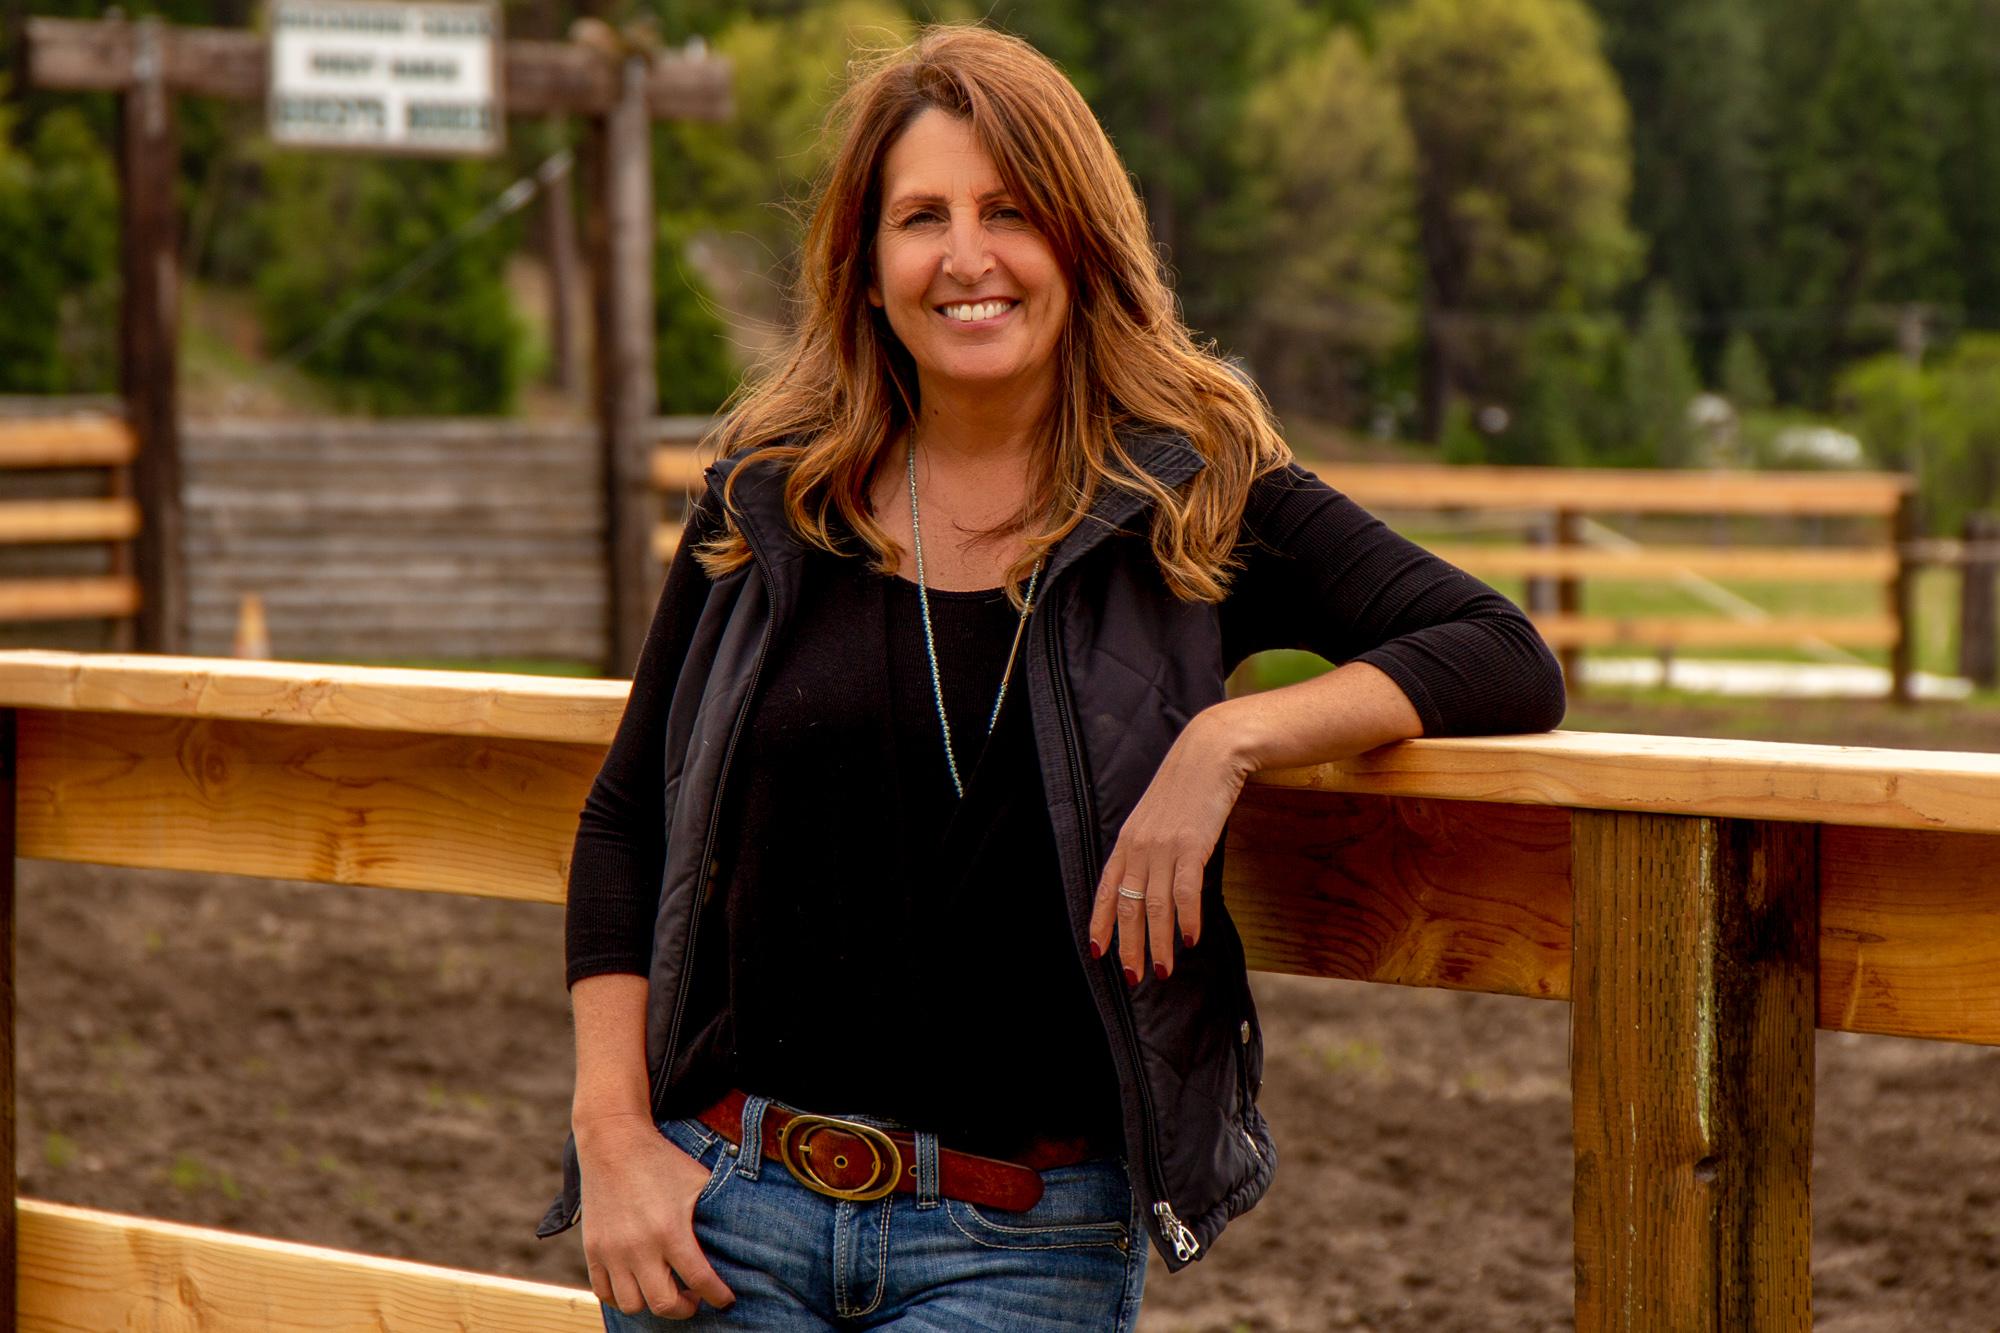 Jill Rivoli, Equine Assisted Learning Facilitator